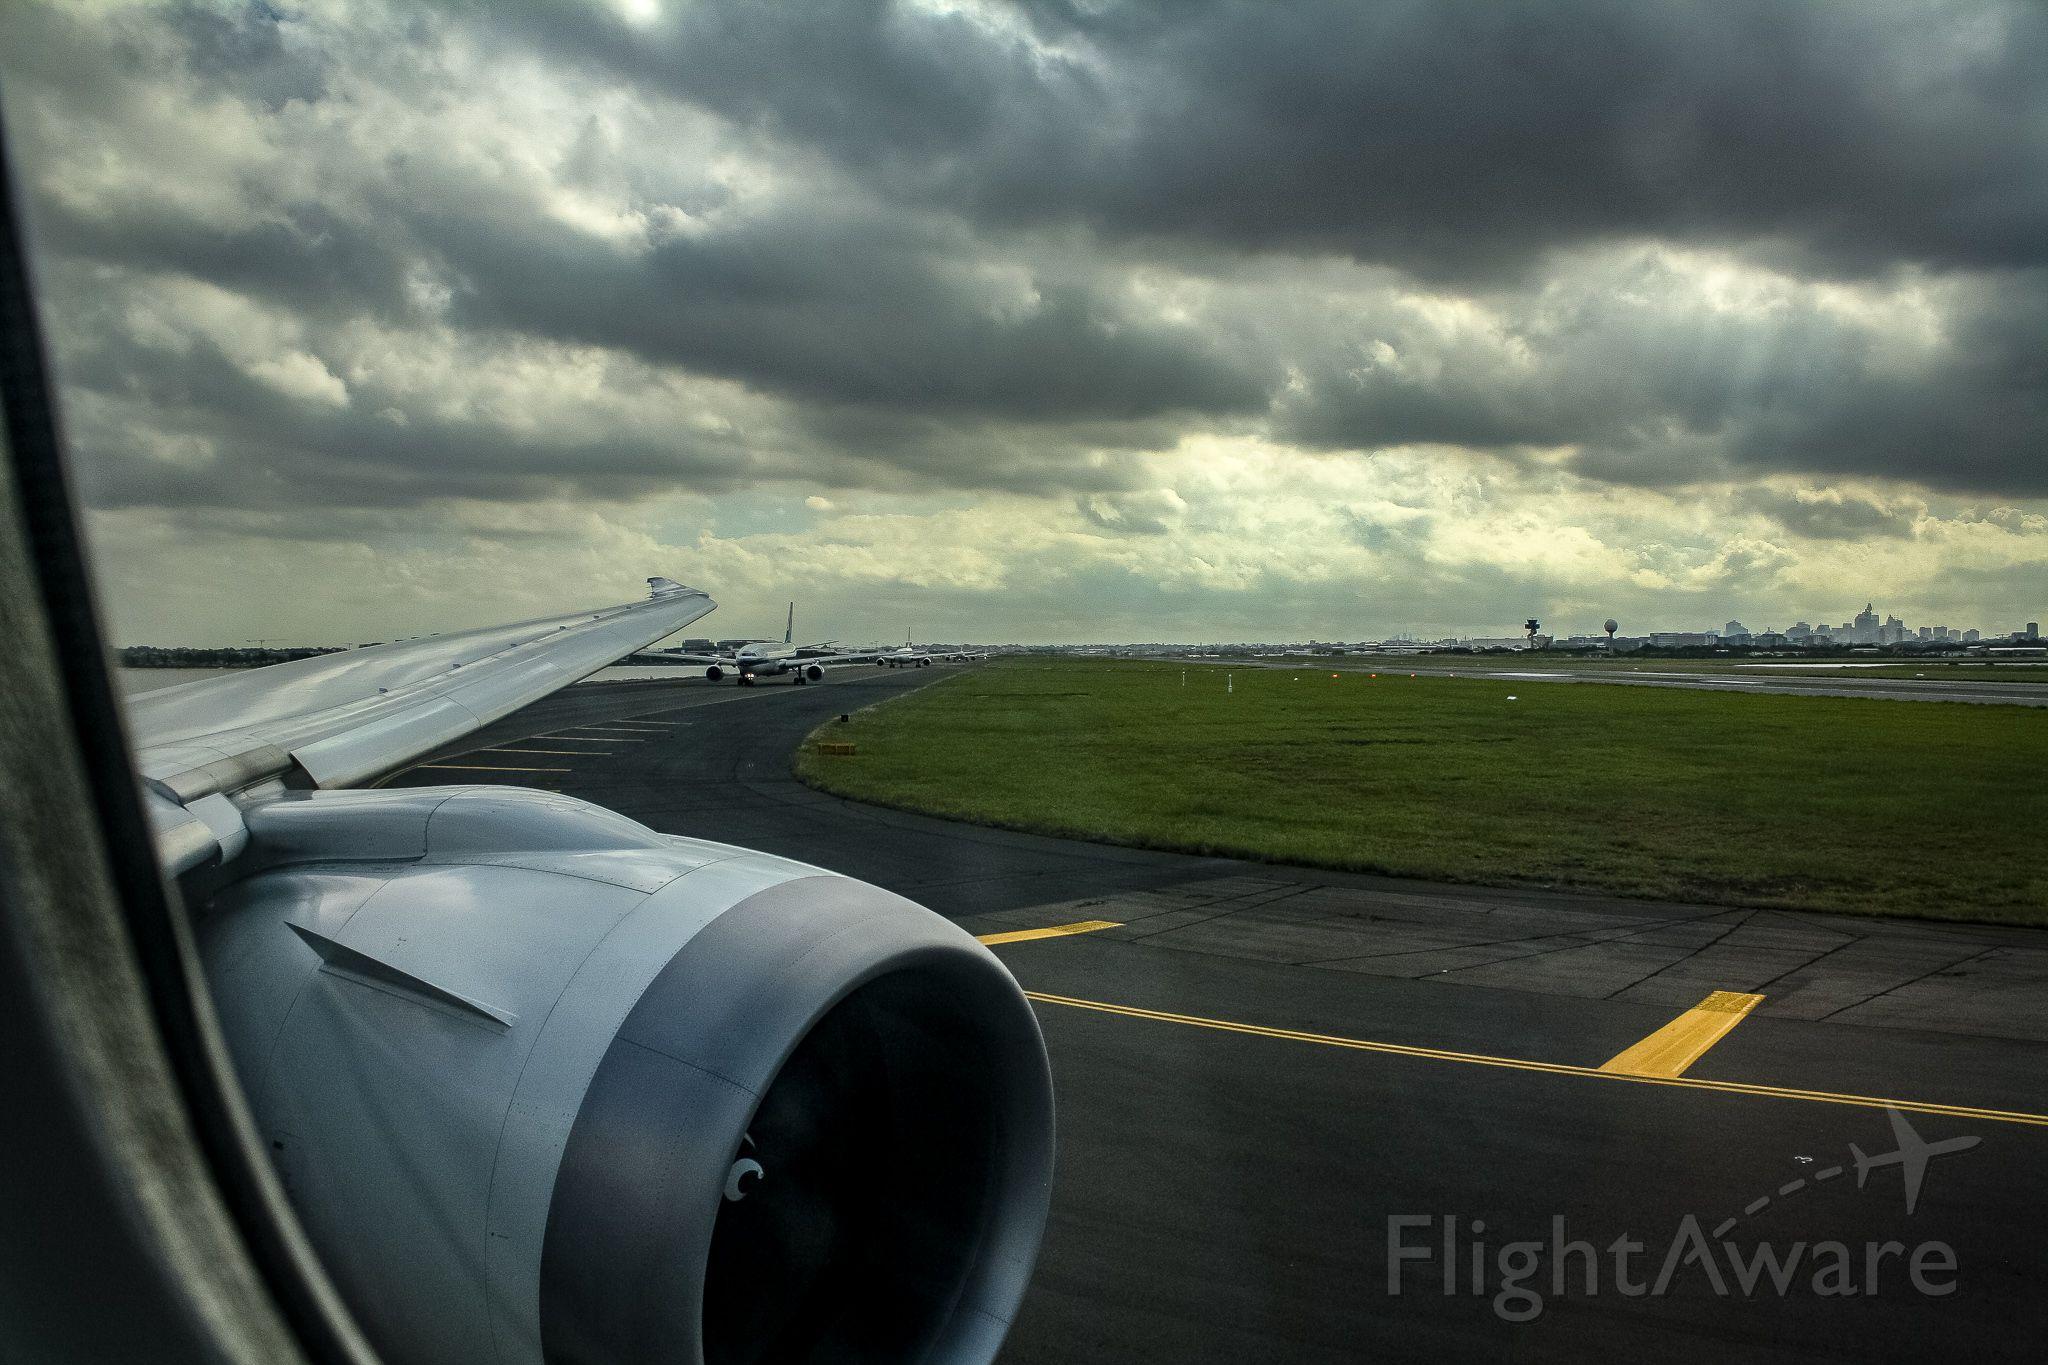 Boeing 787-9 Dreamliner (N45956) - Headed out of Sydney bound for San Francisco